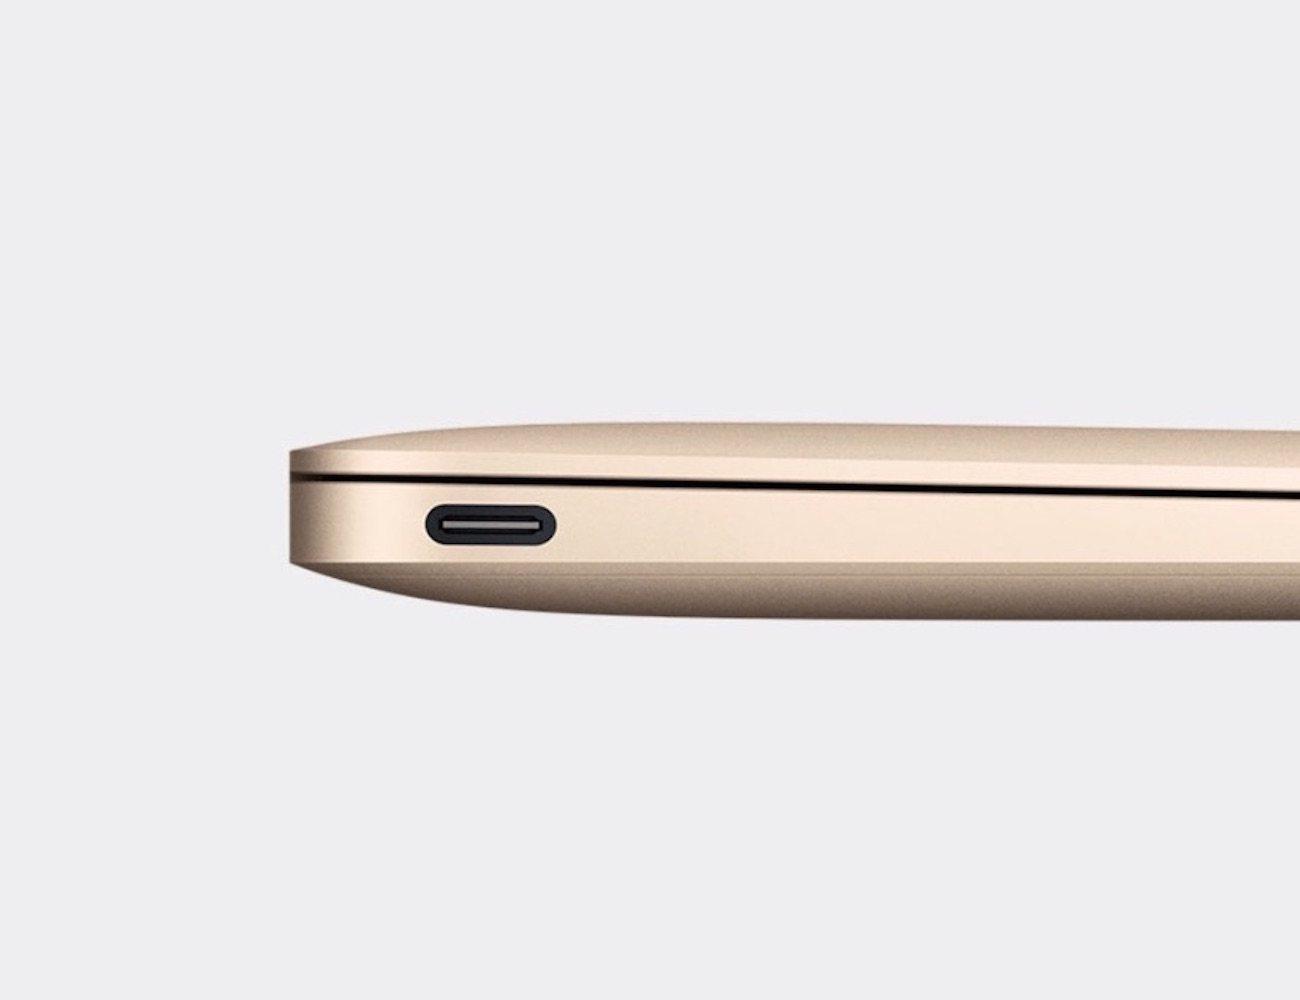 The New Macbook 12 Inch Retina